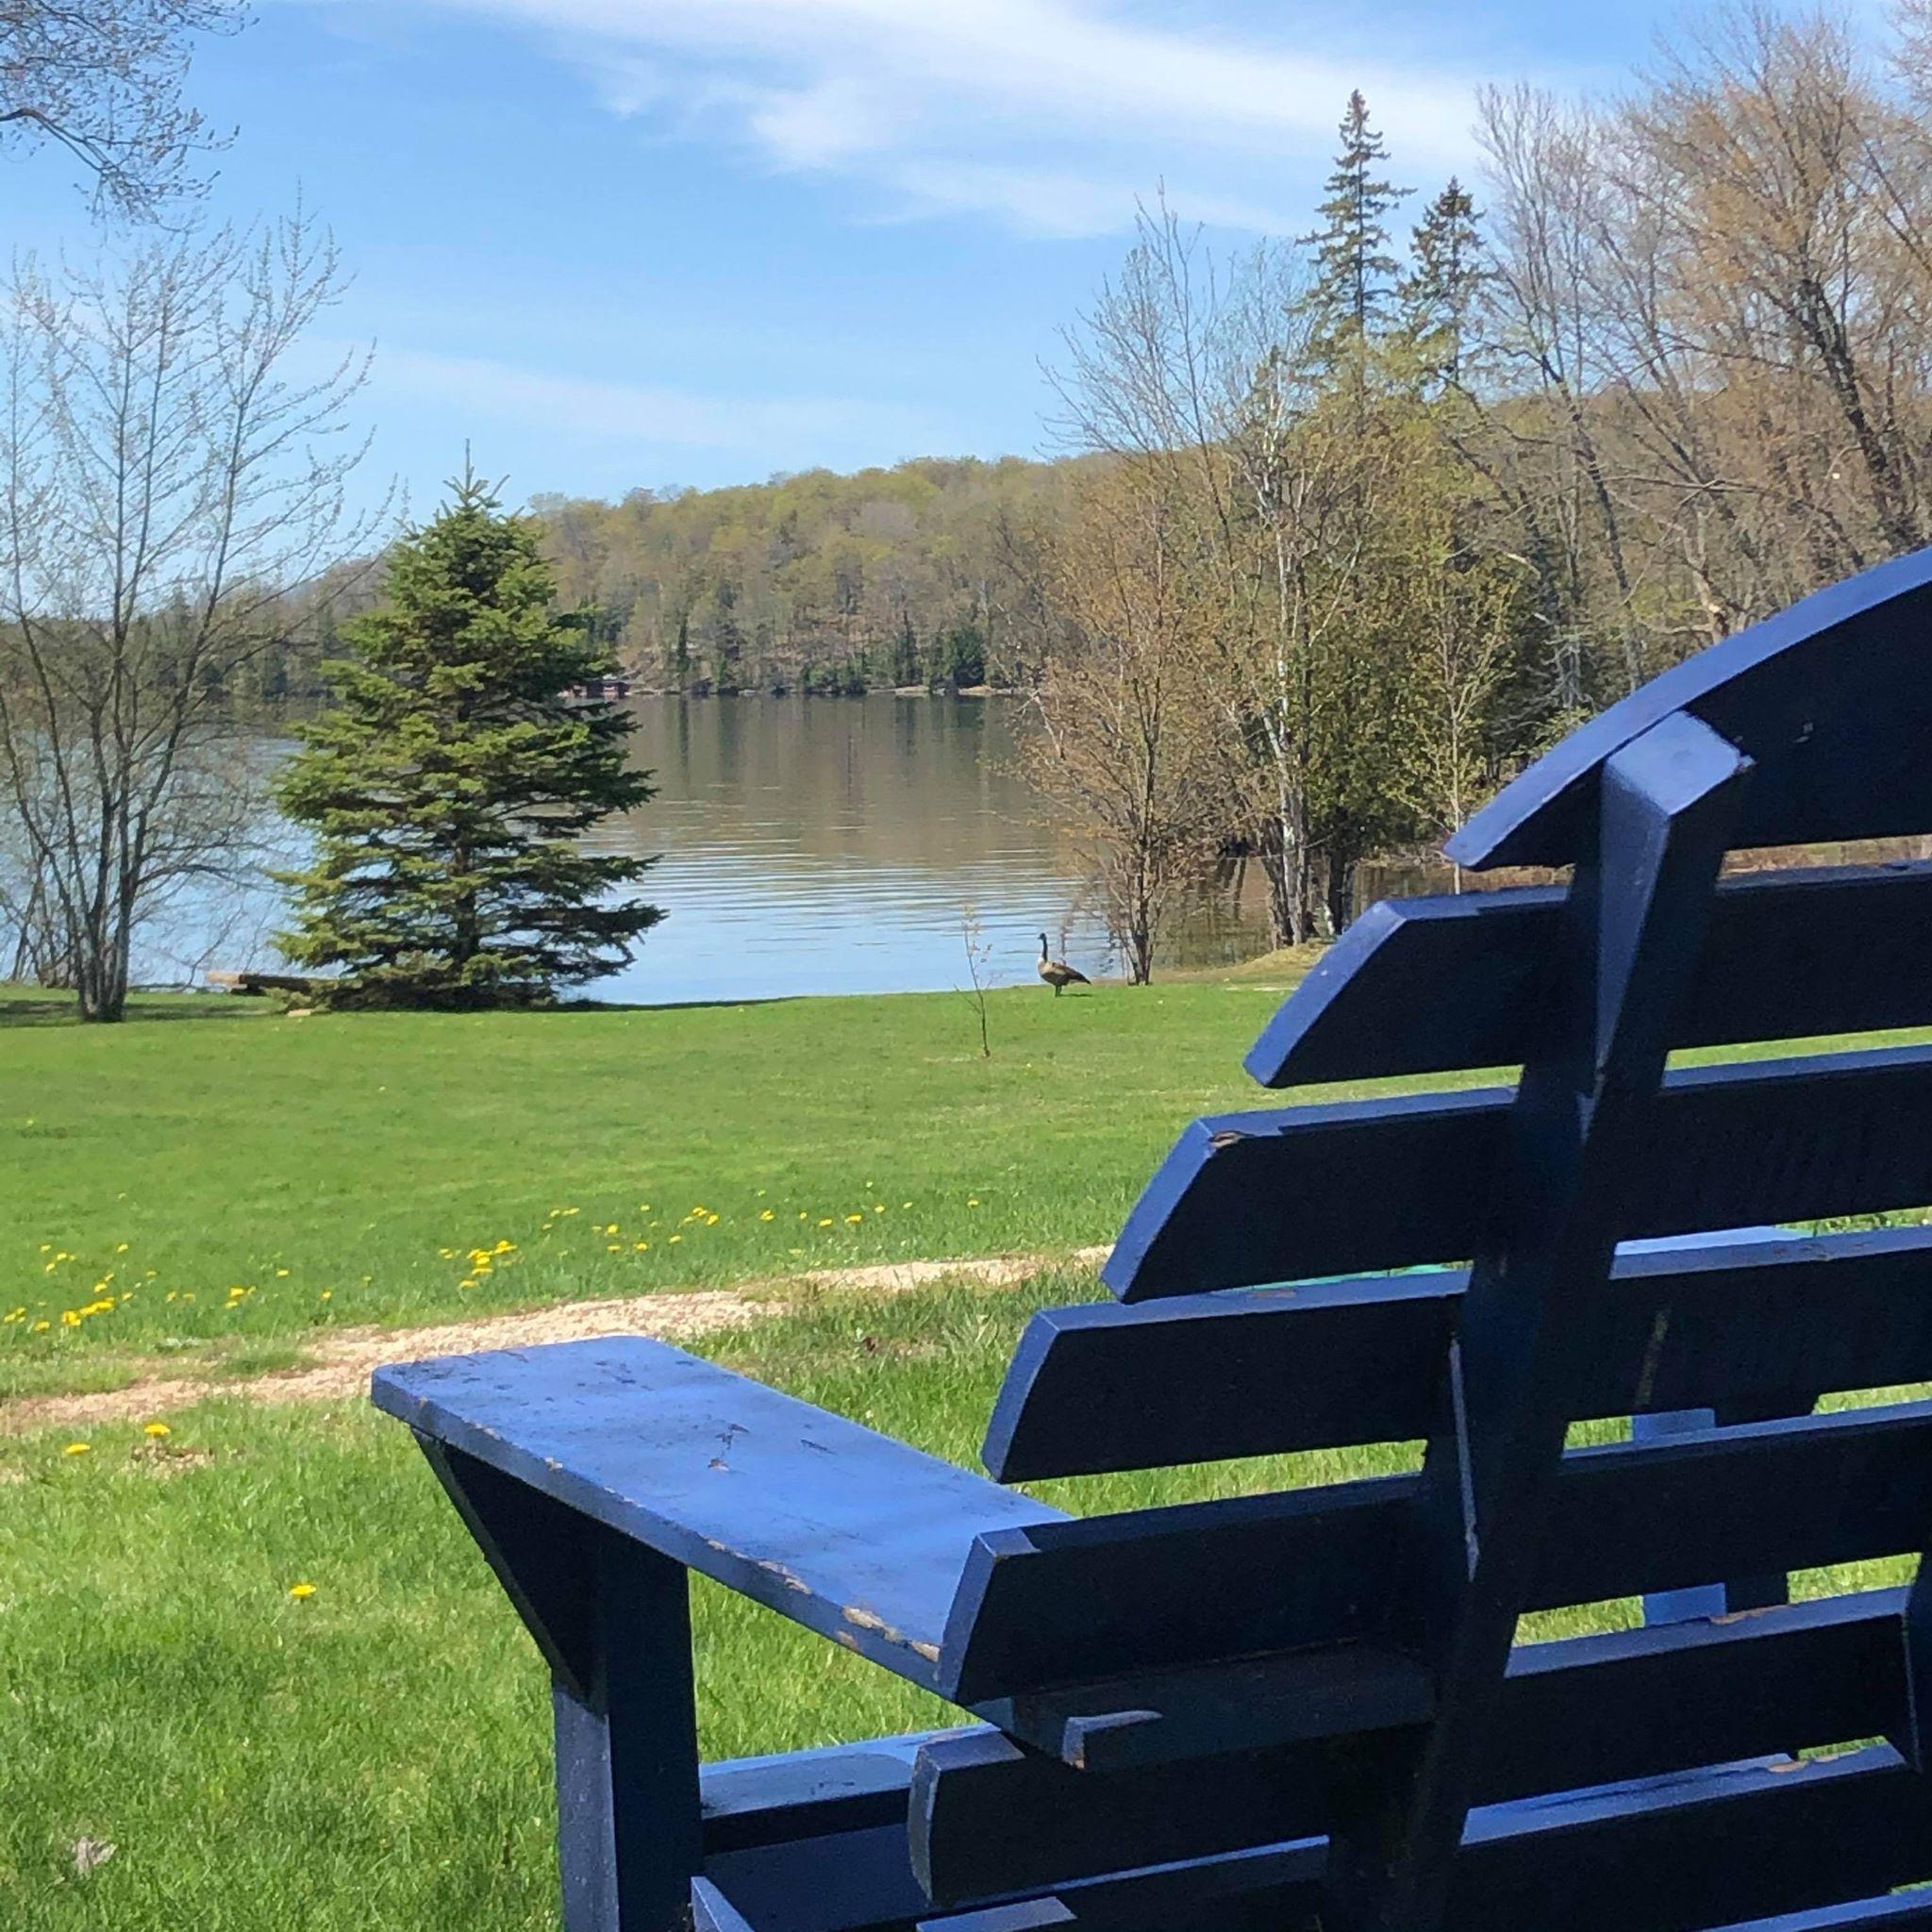 looking at lake with Muskoka Chair